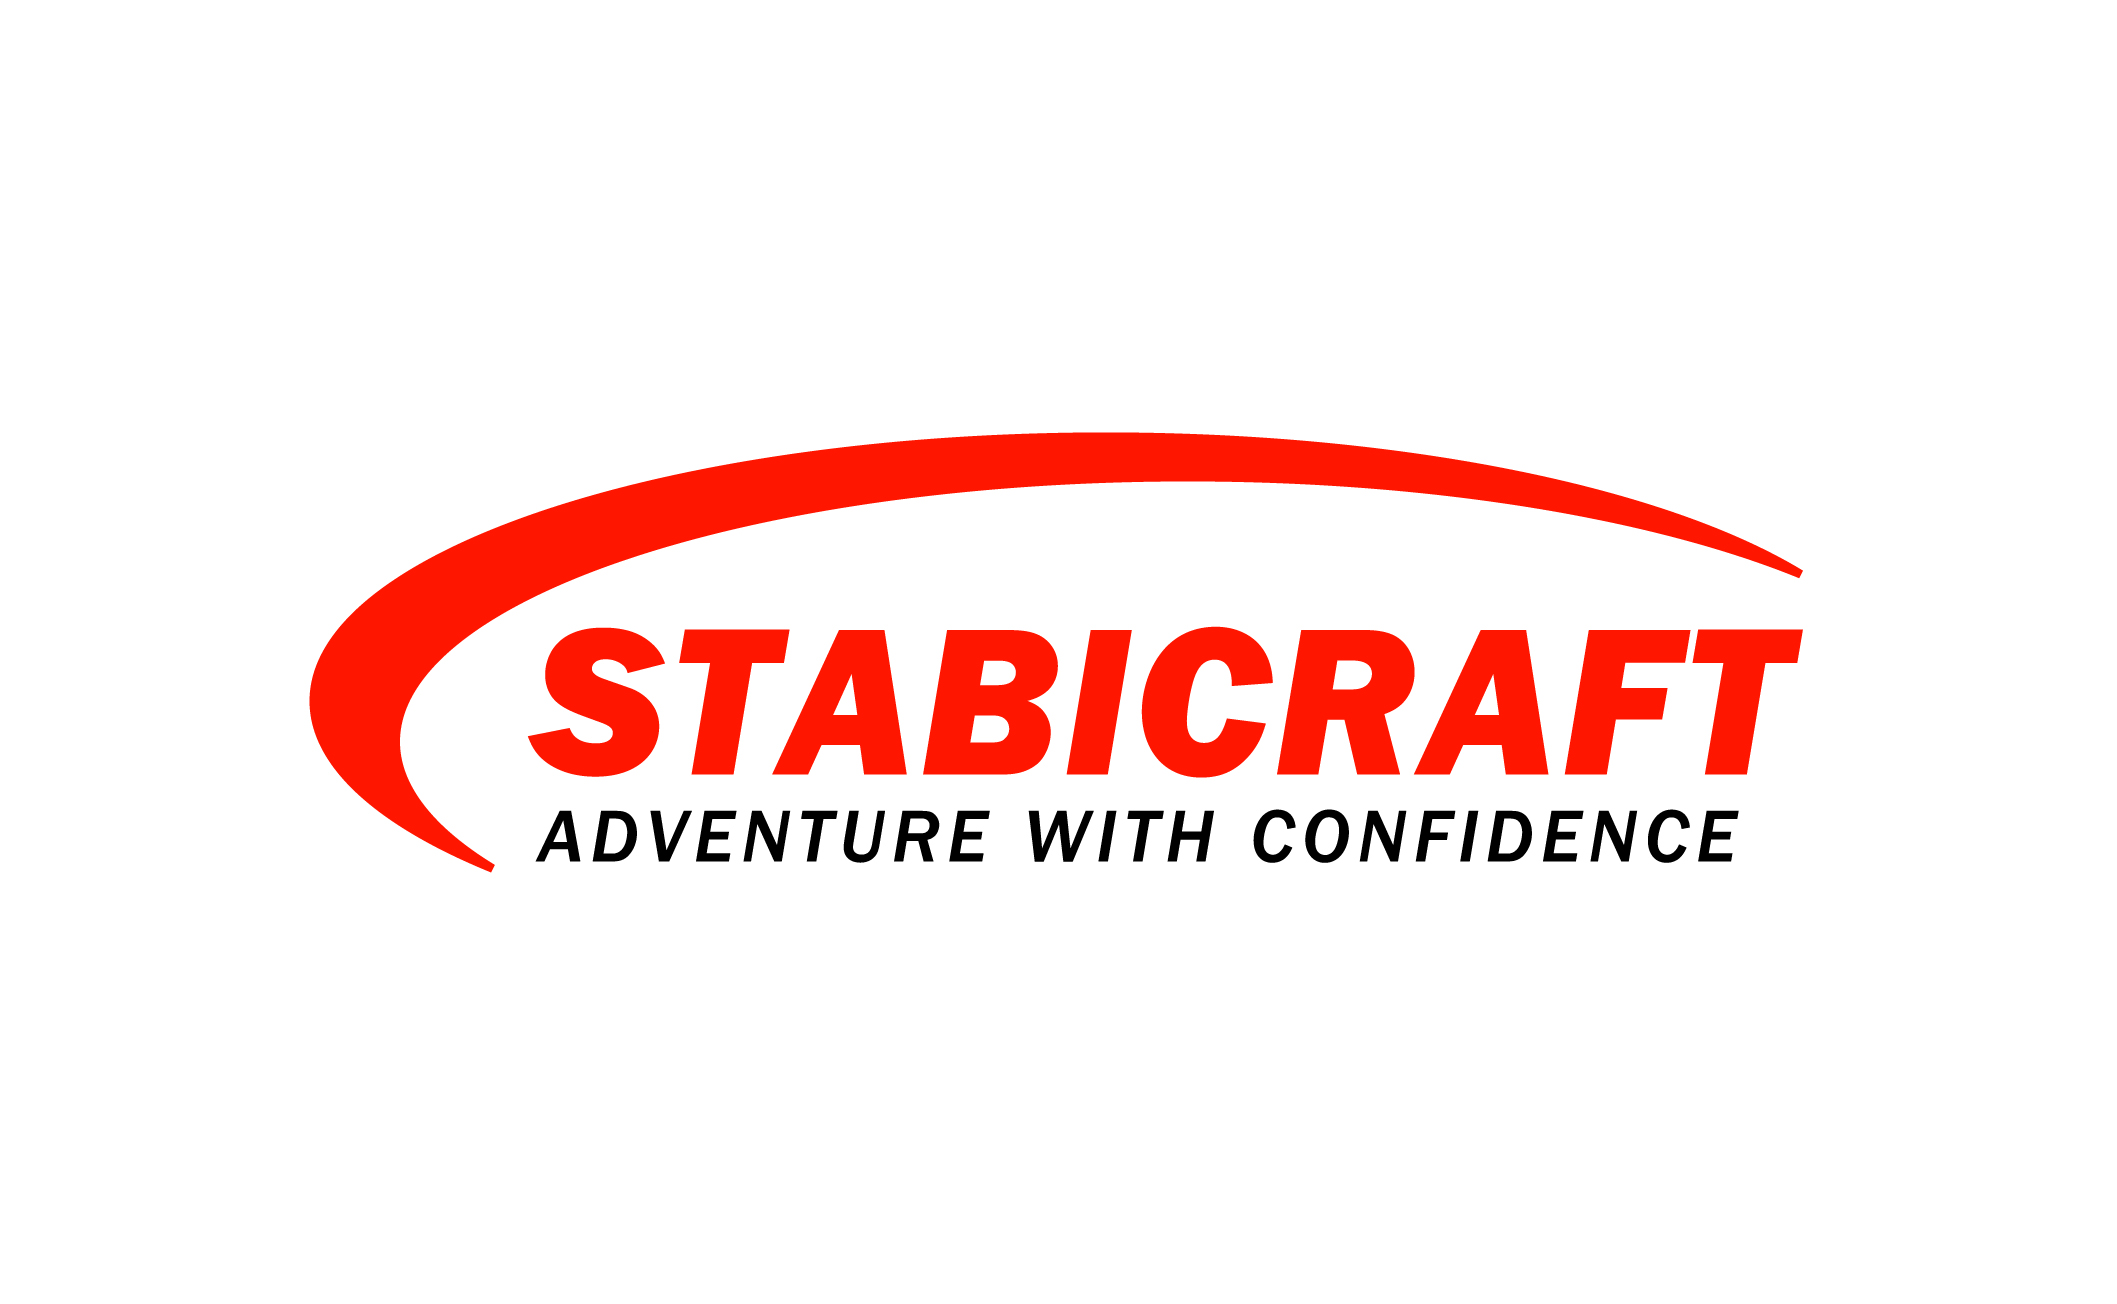 STABICRAFT-primary_CMYK.jpg